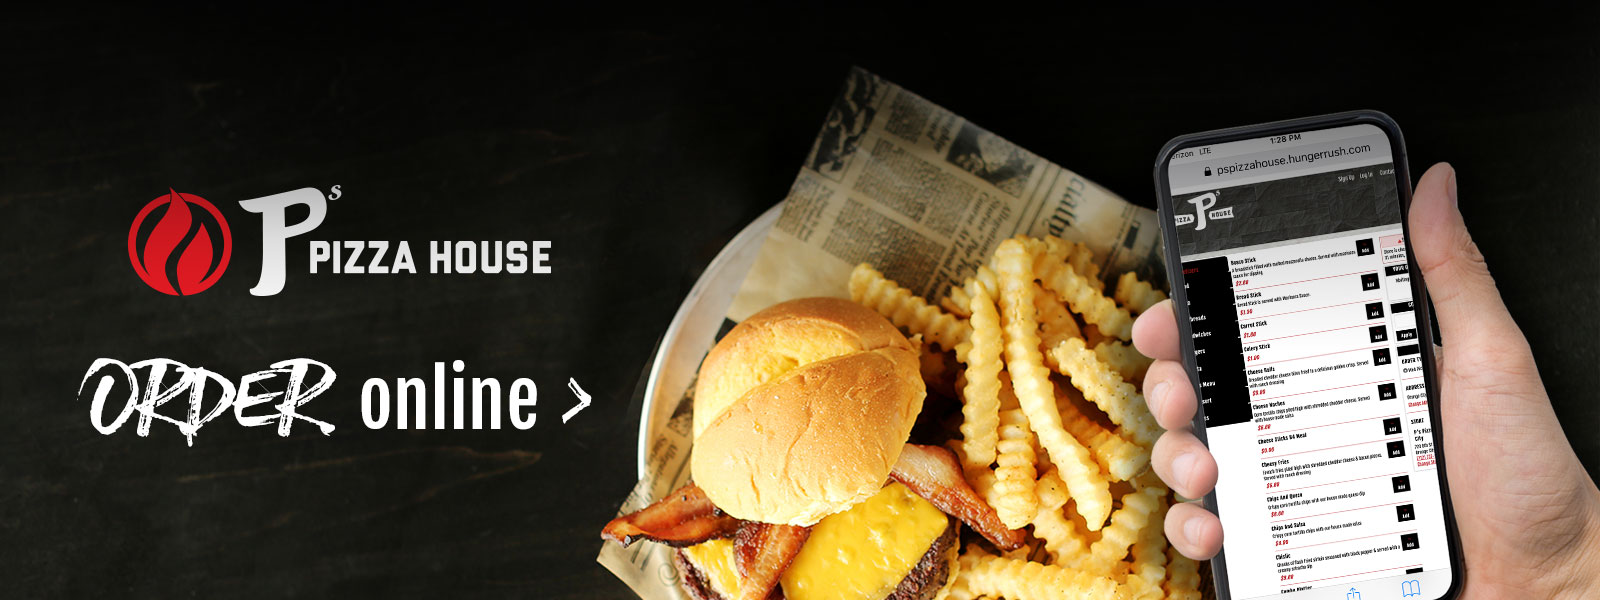 Order Online | P's Pizza House | Le Mars, IA, Orange City, IA, and Dakota Dunes, SD